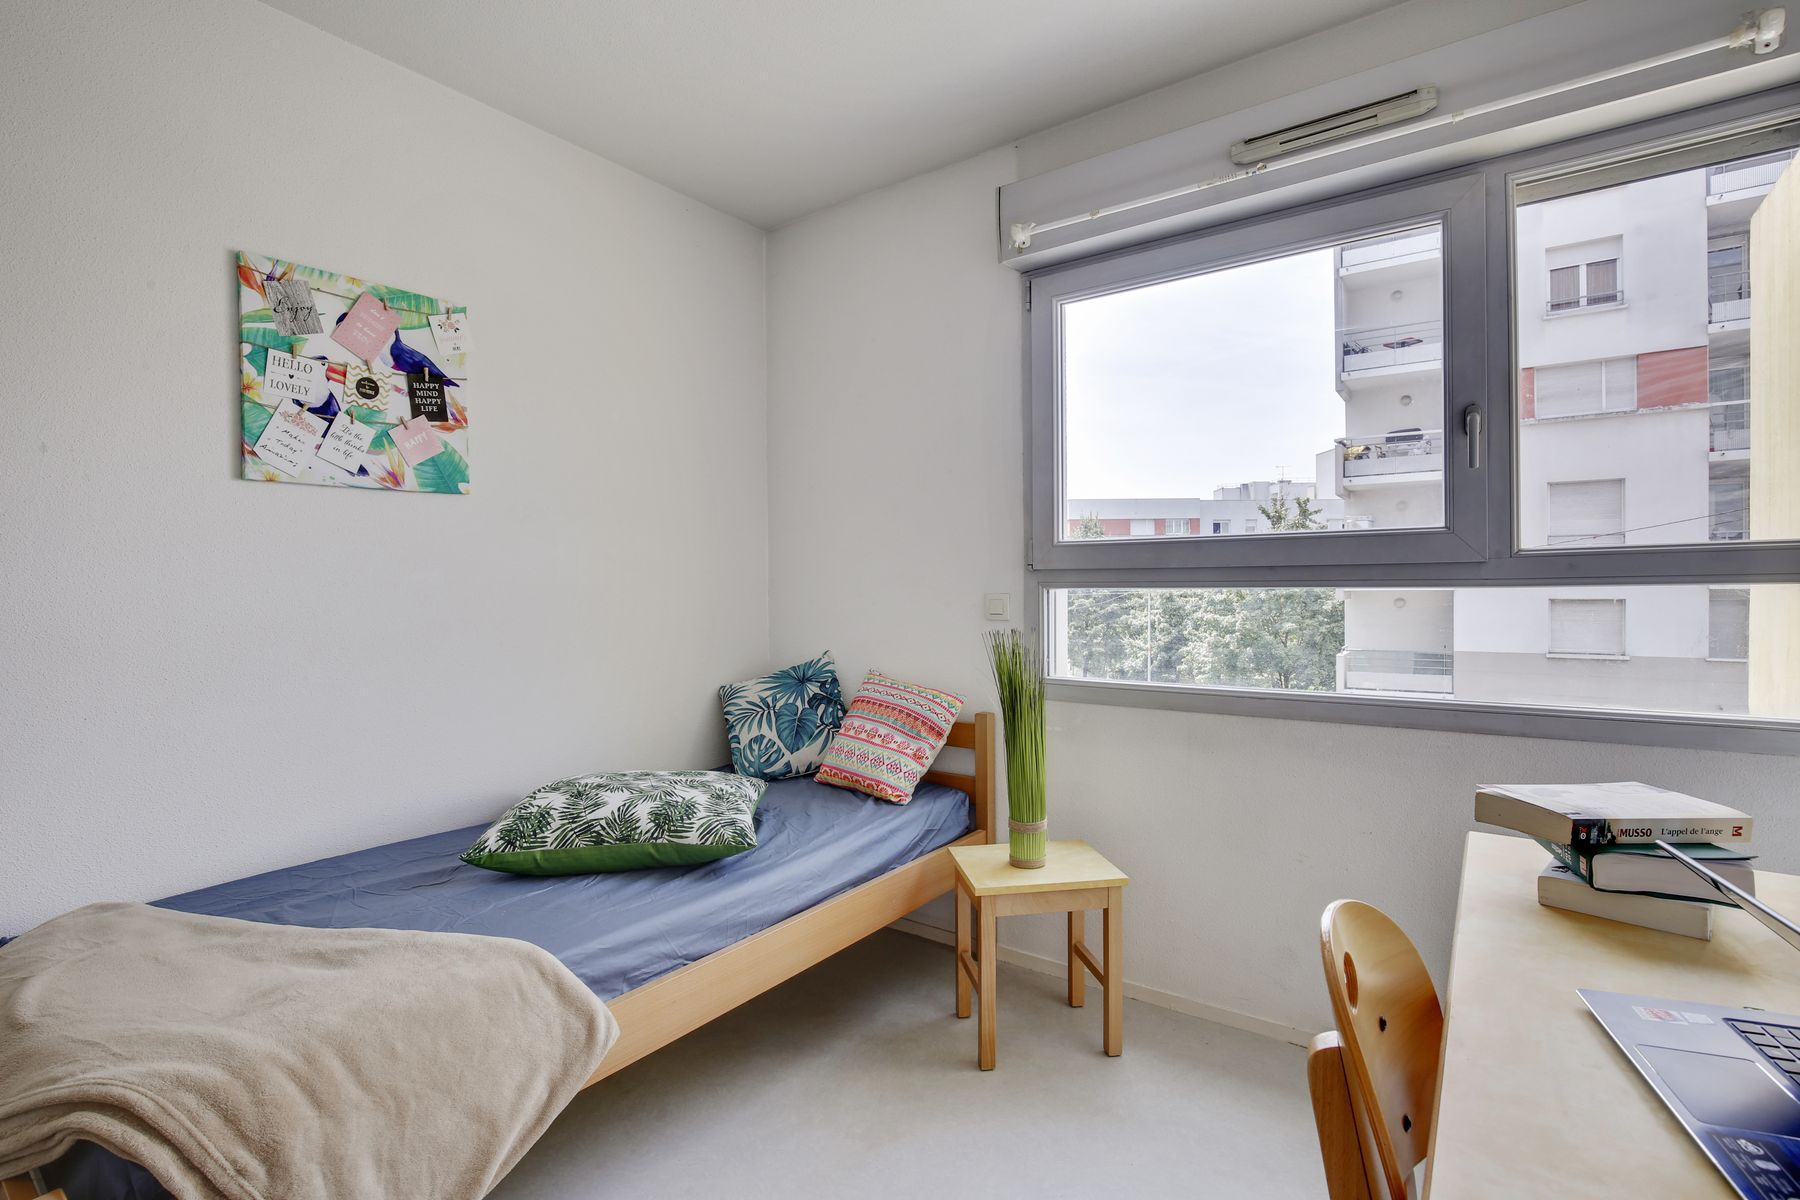 LOGIFAC résidence étudiante Léo Ferré Orly studio